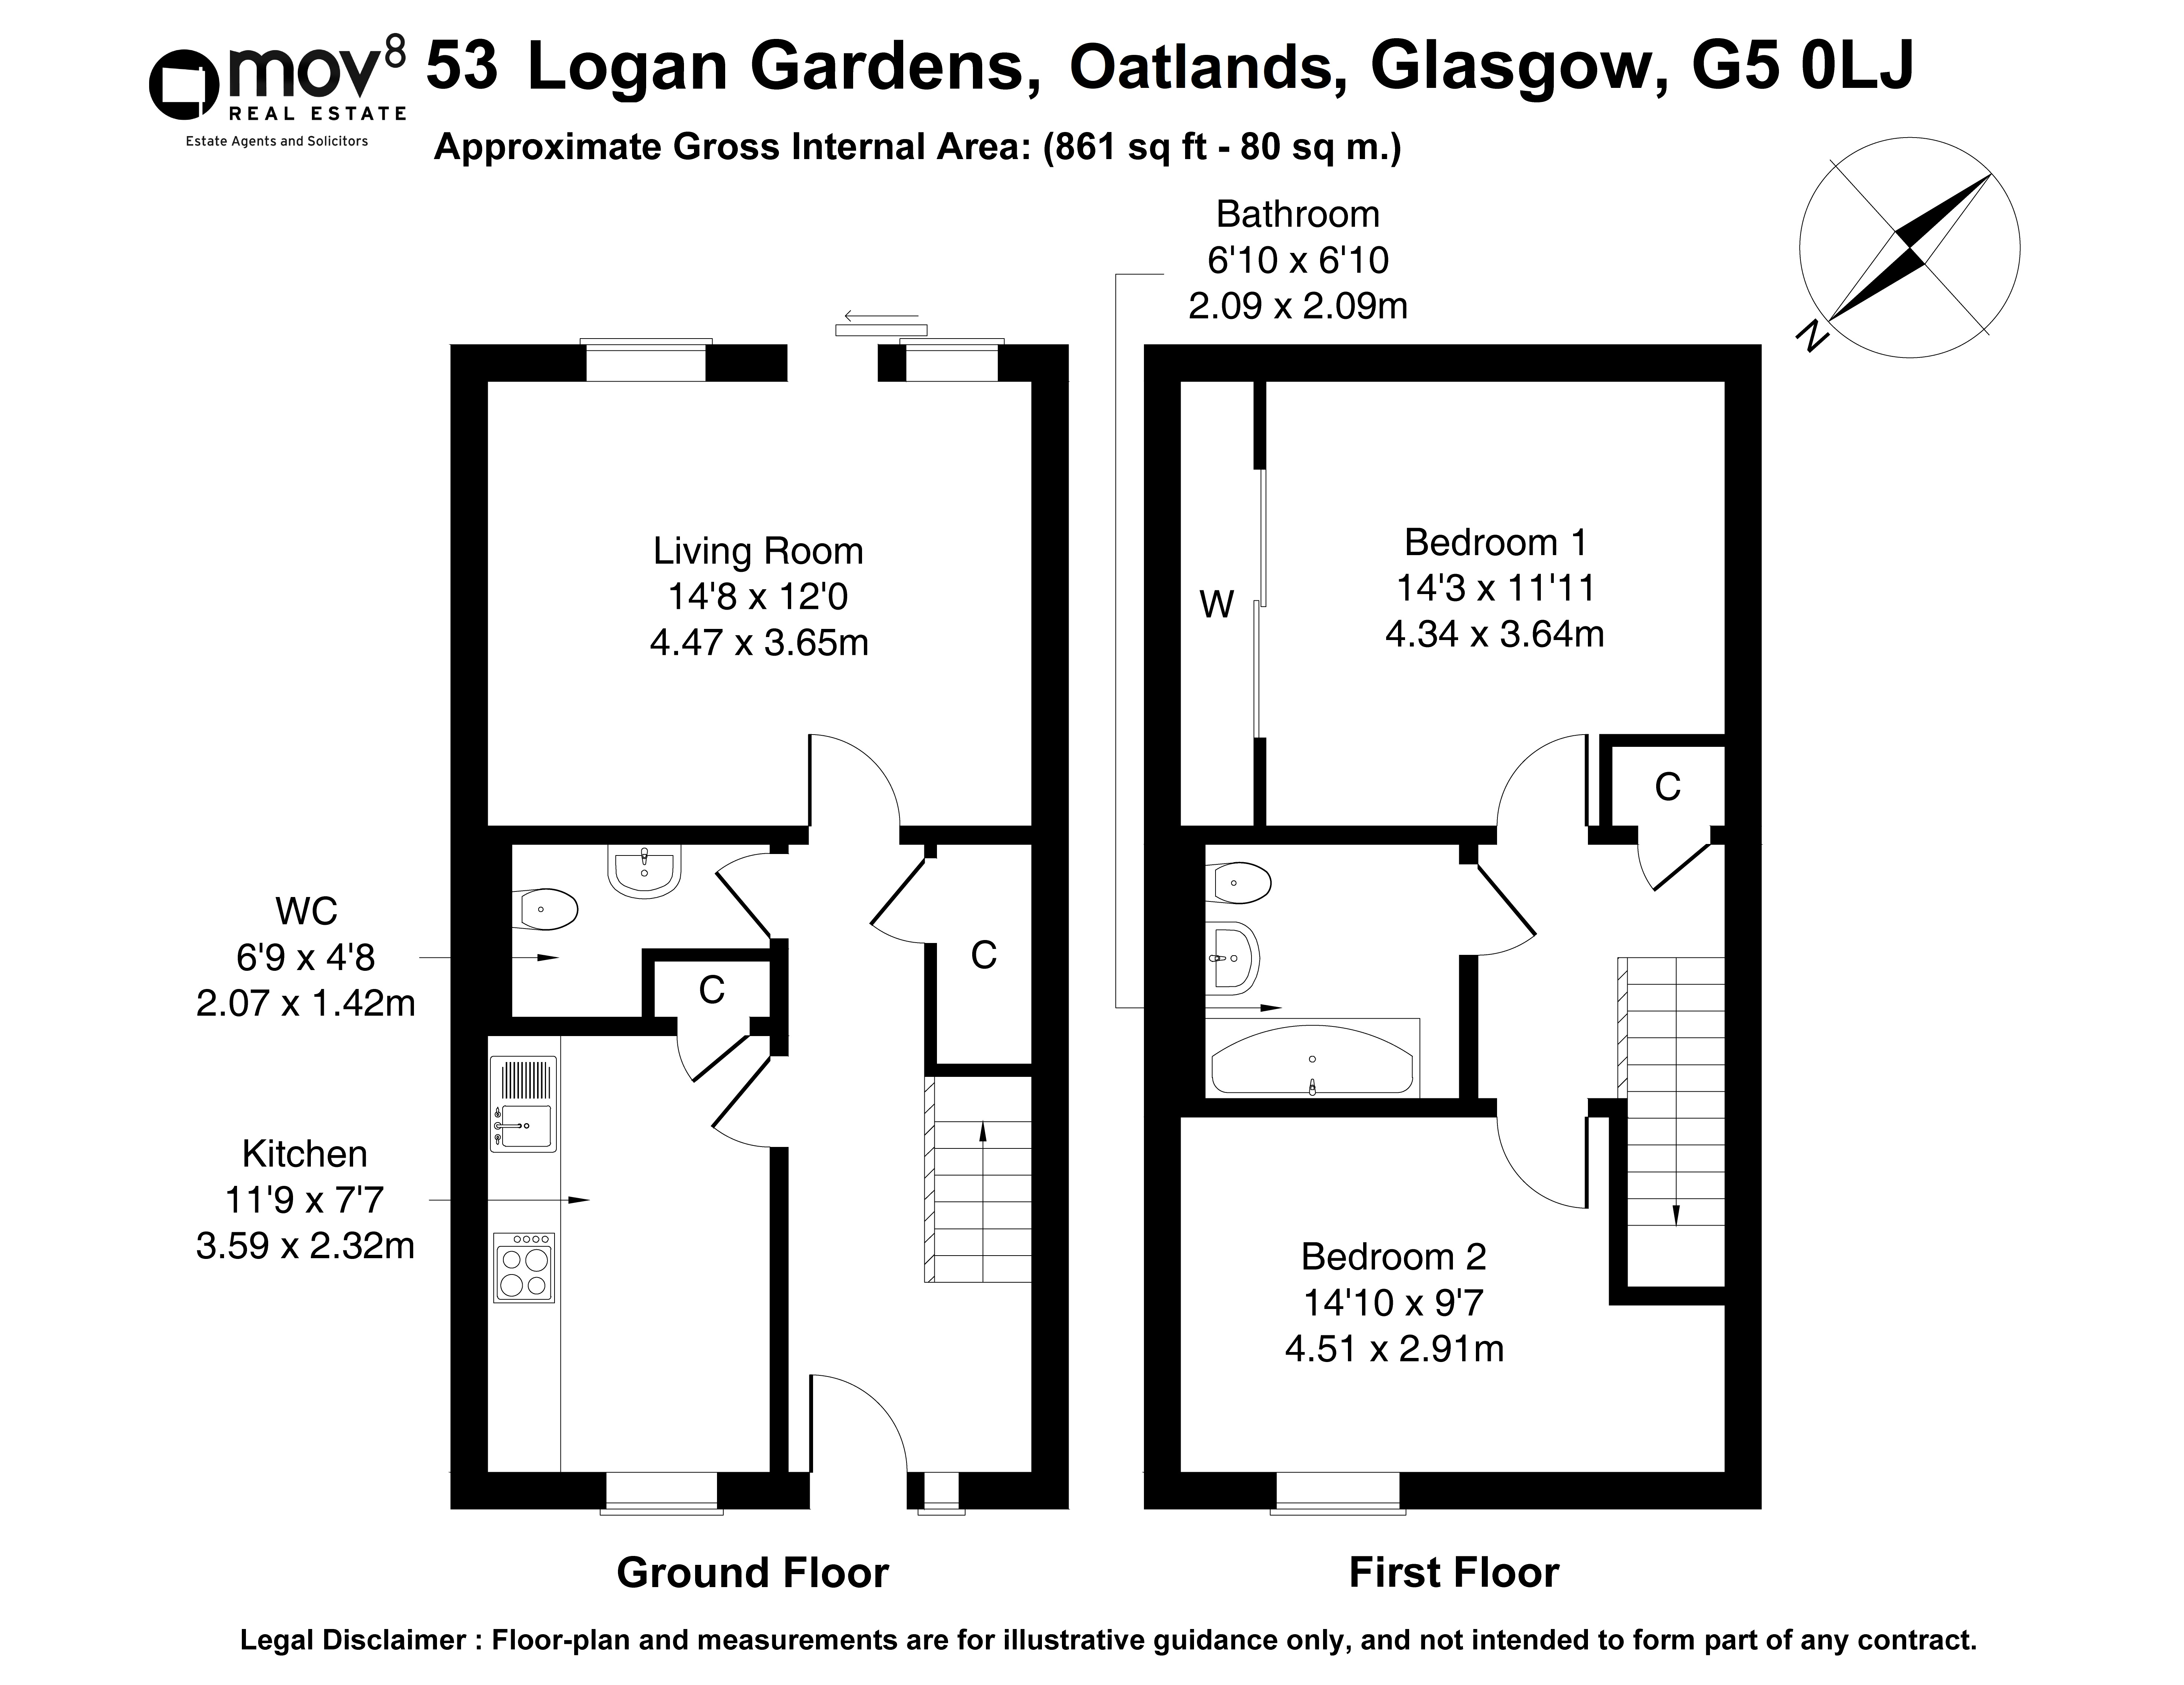 Floorplan 1 of 53 Logan Gardens, Oatlands, Glasgow, G5 0LJ